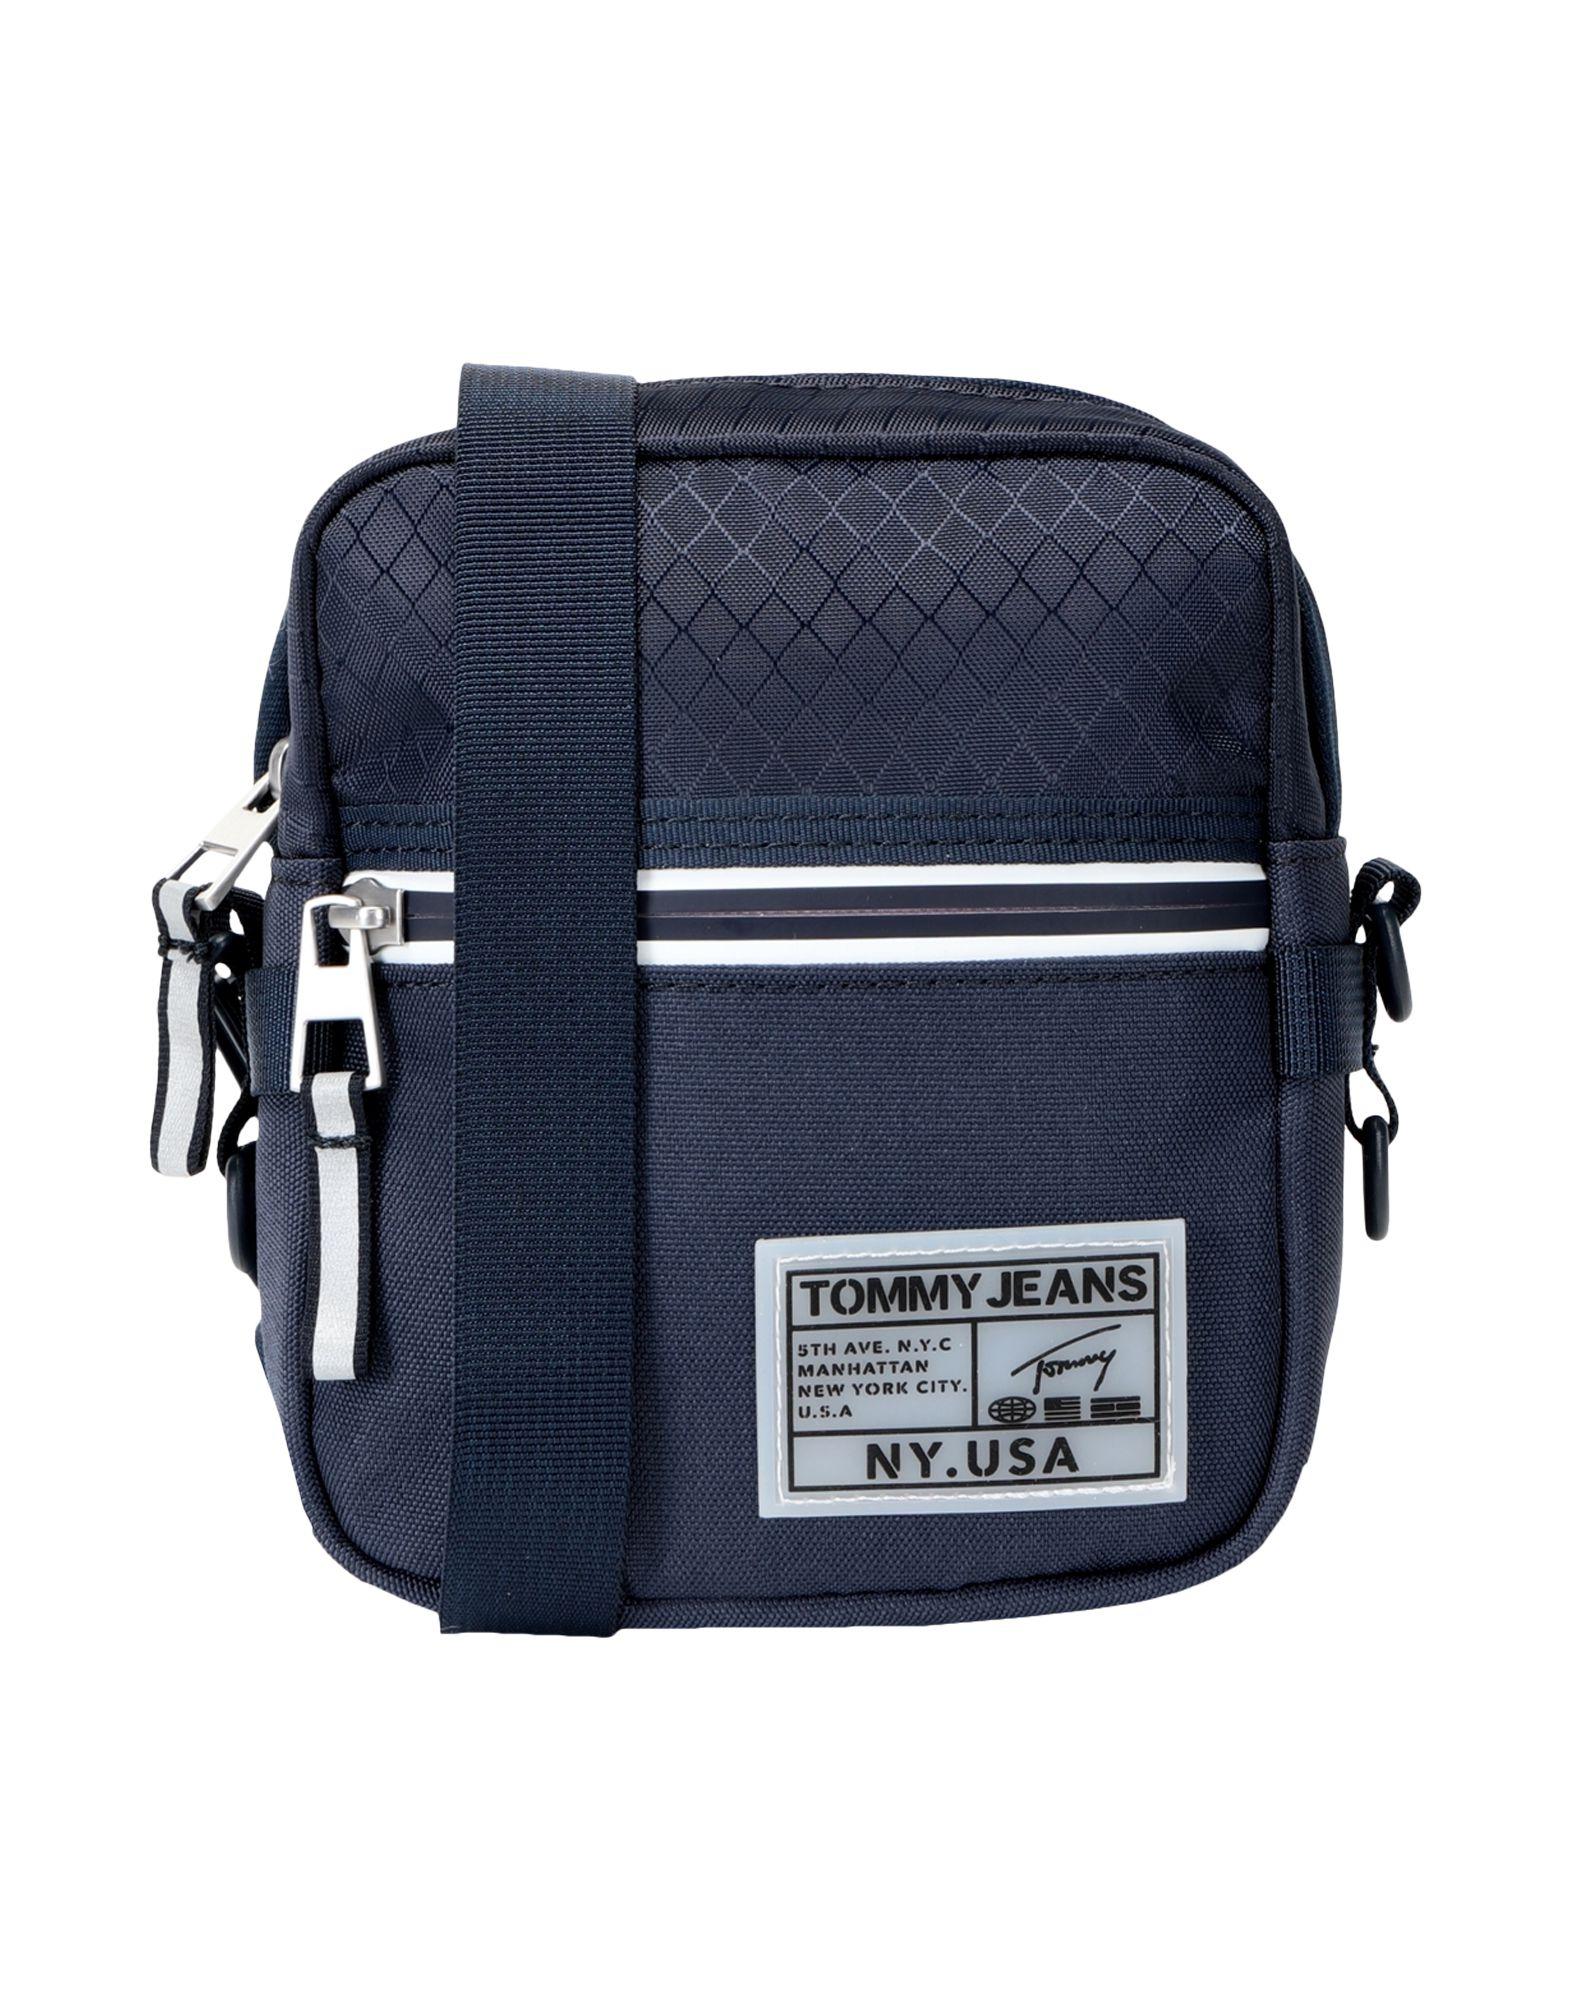 TOMMY JEANS Cross-body bags - Item 45540773